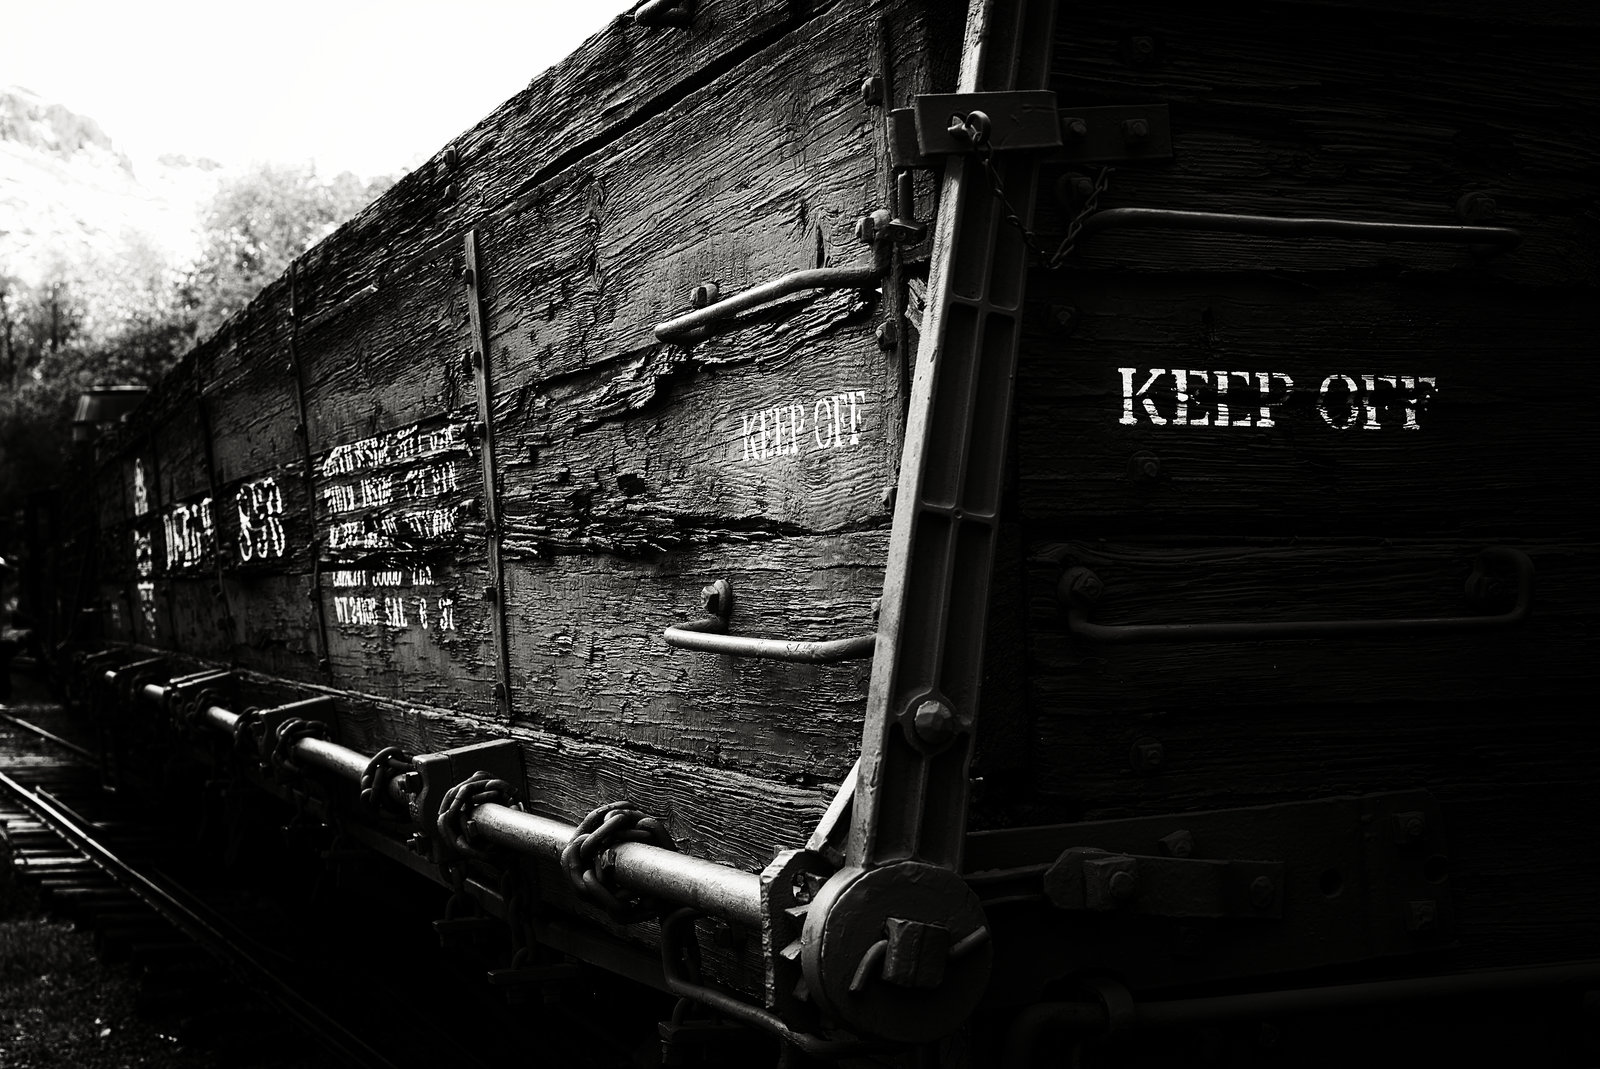 KeepOff.jpg